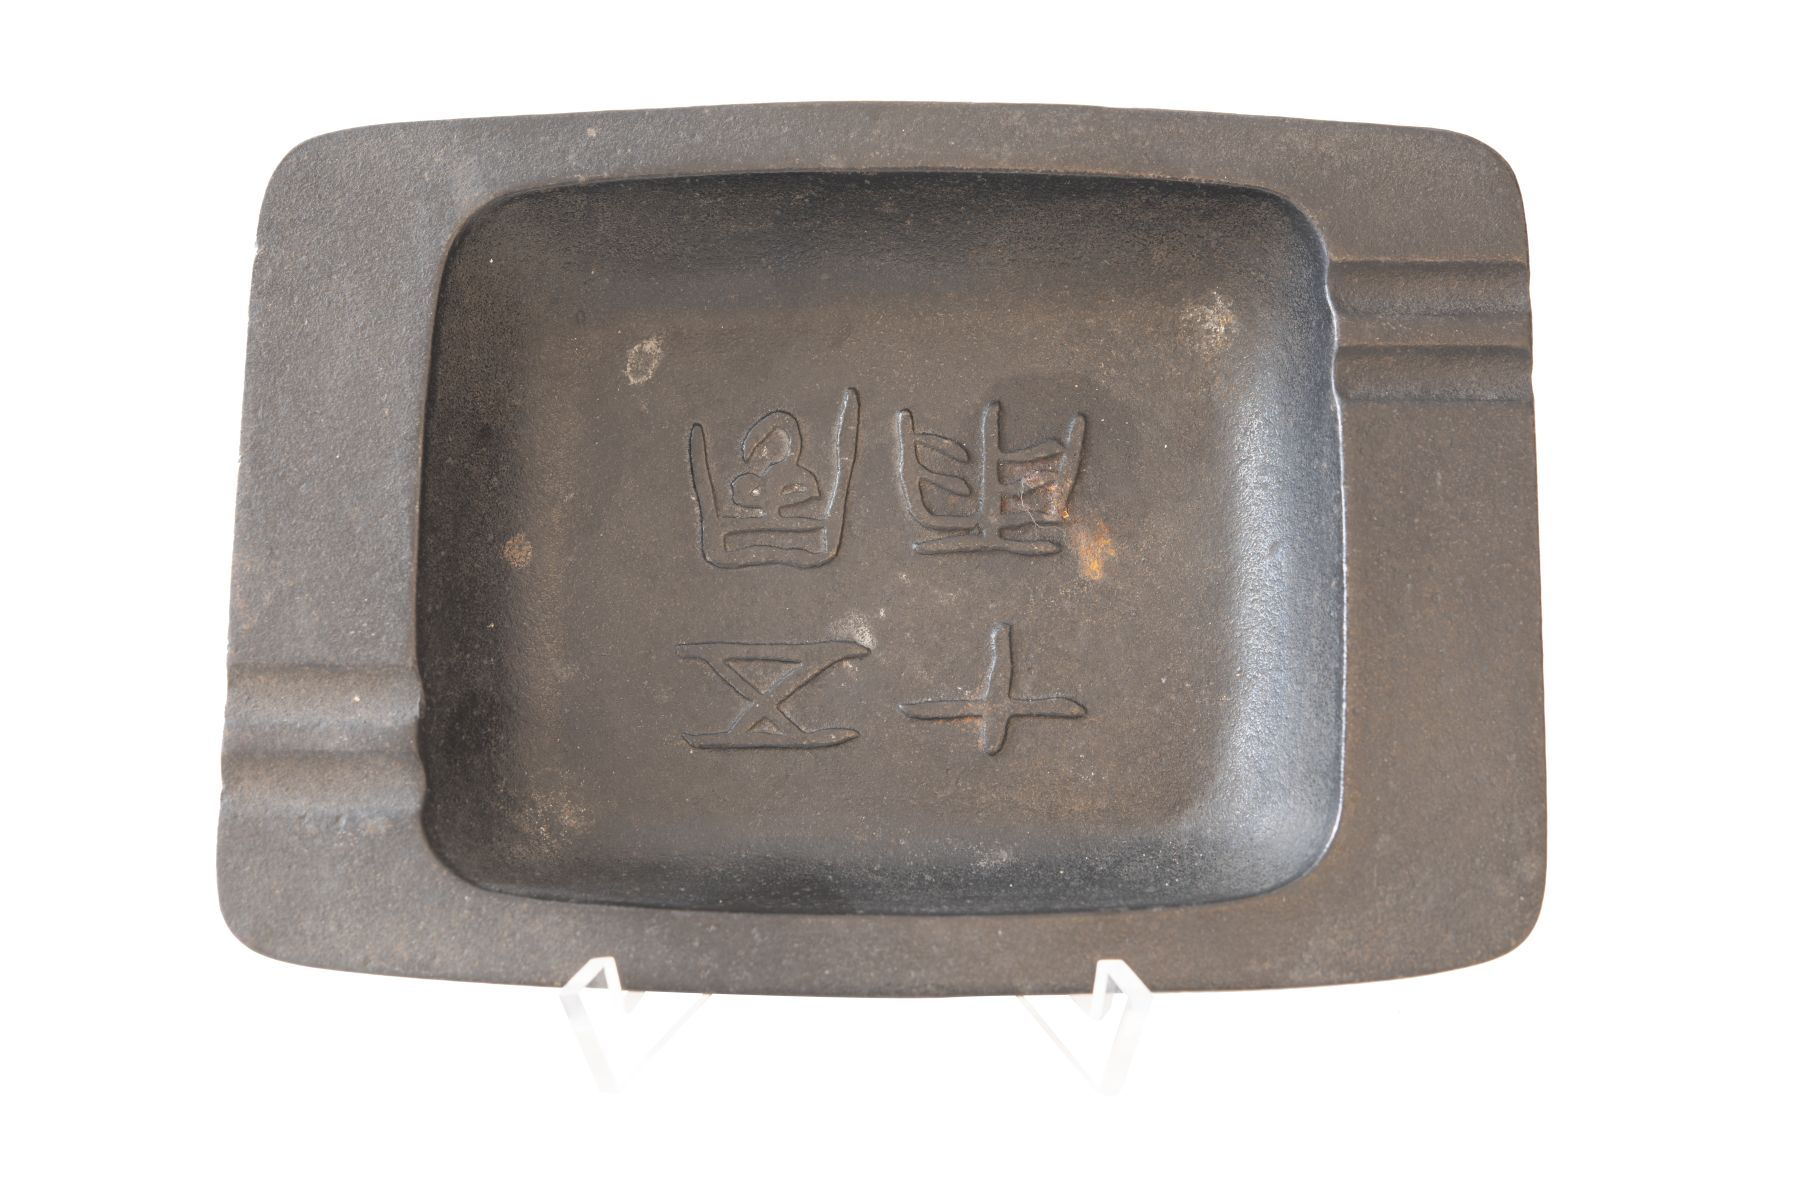 #60 Cast iron ashtray | Aschenbecher Image